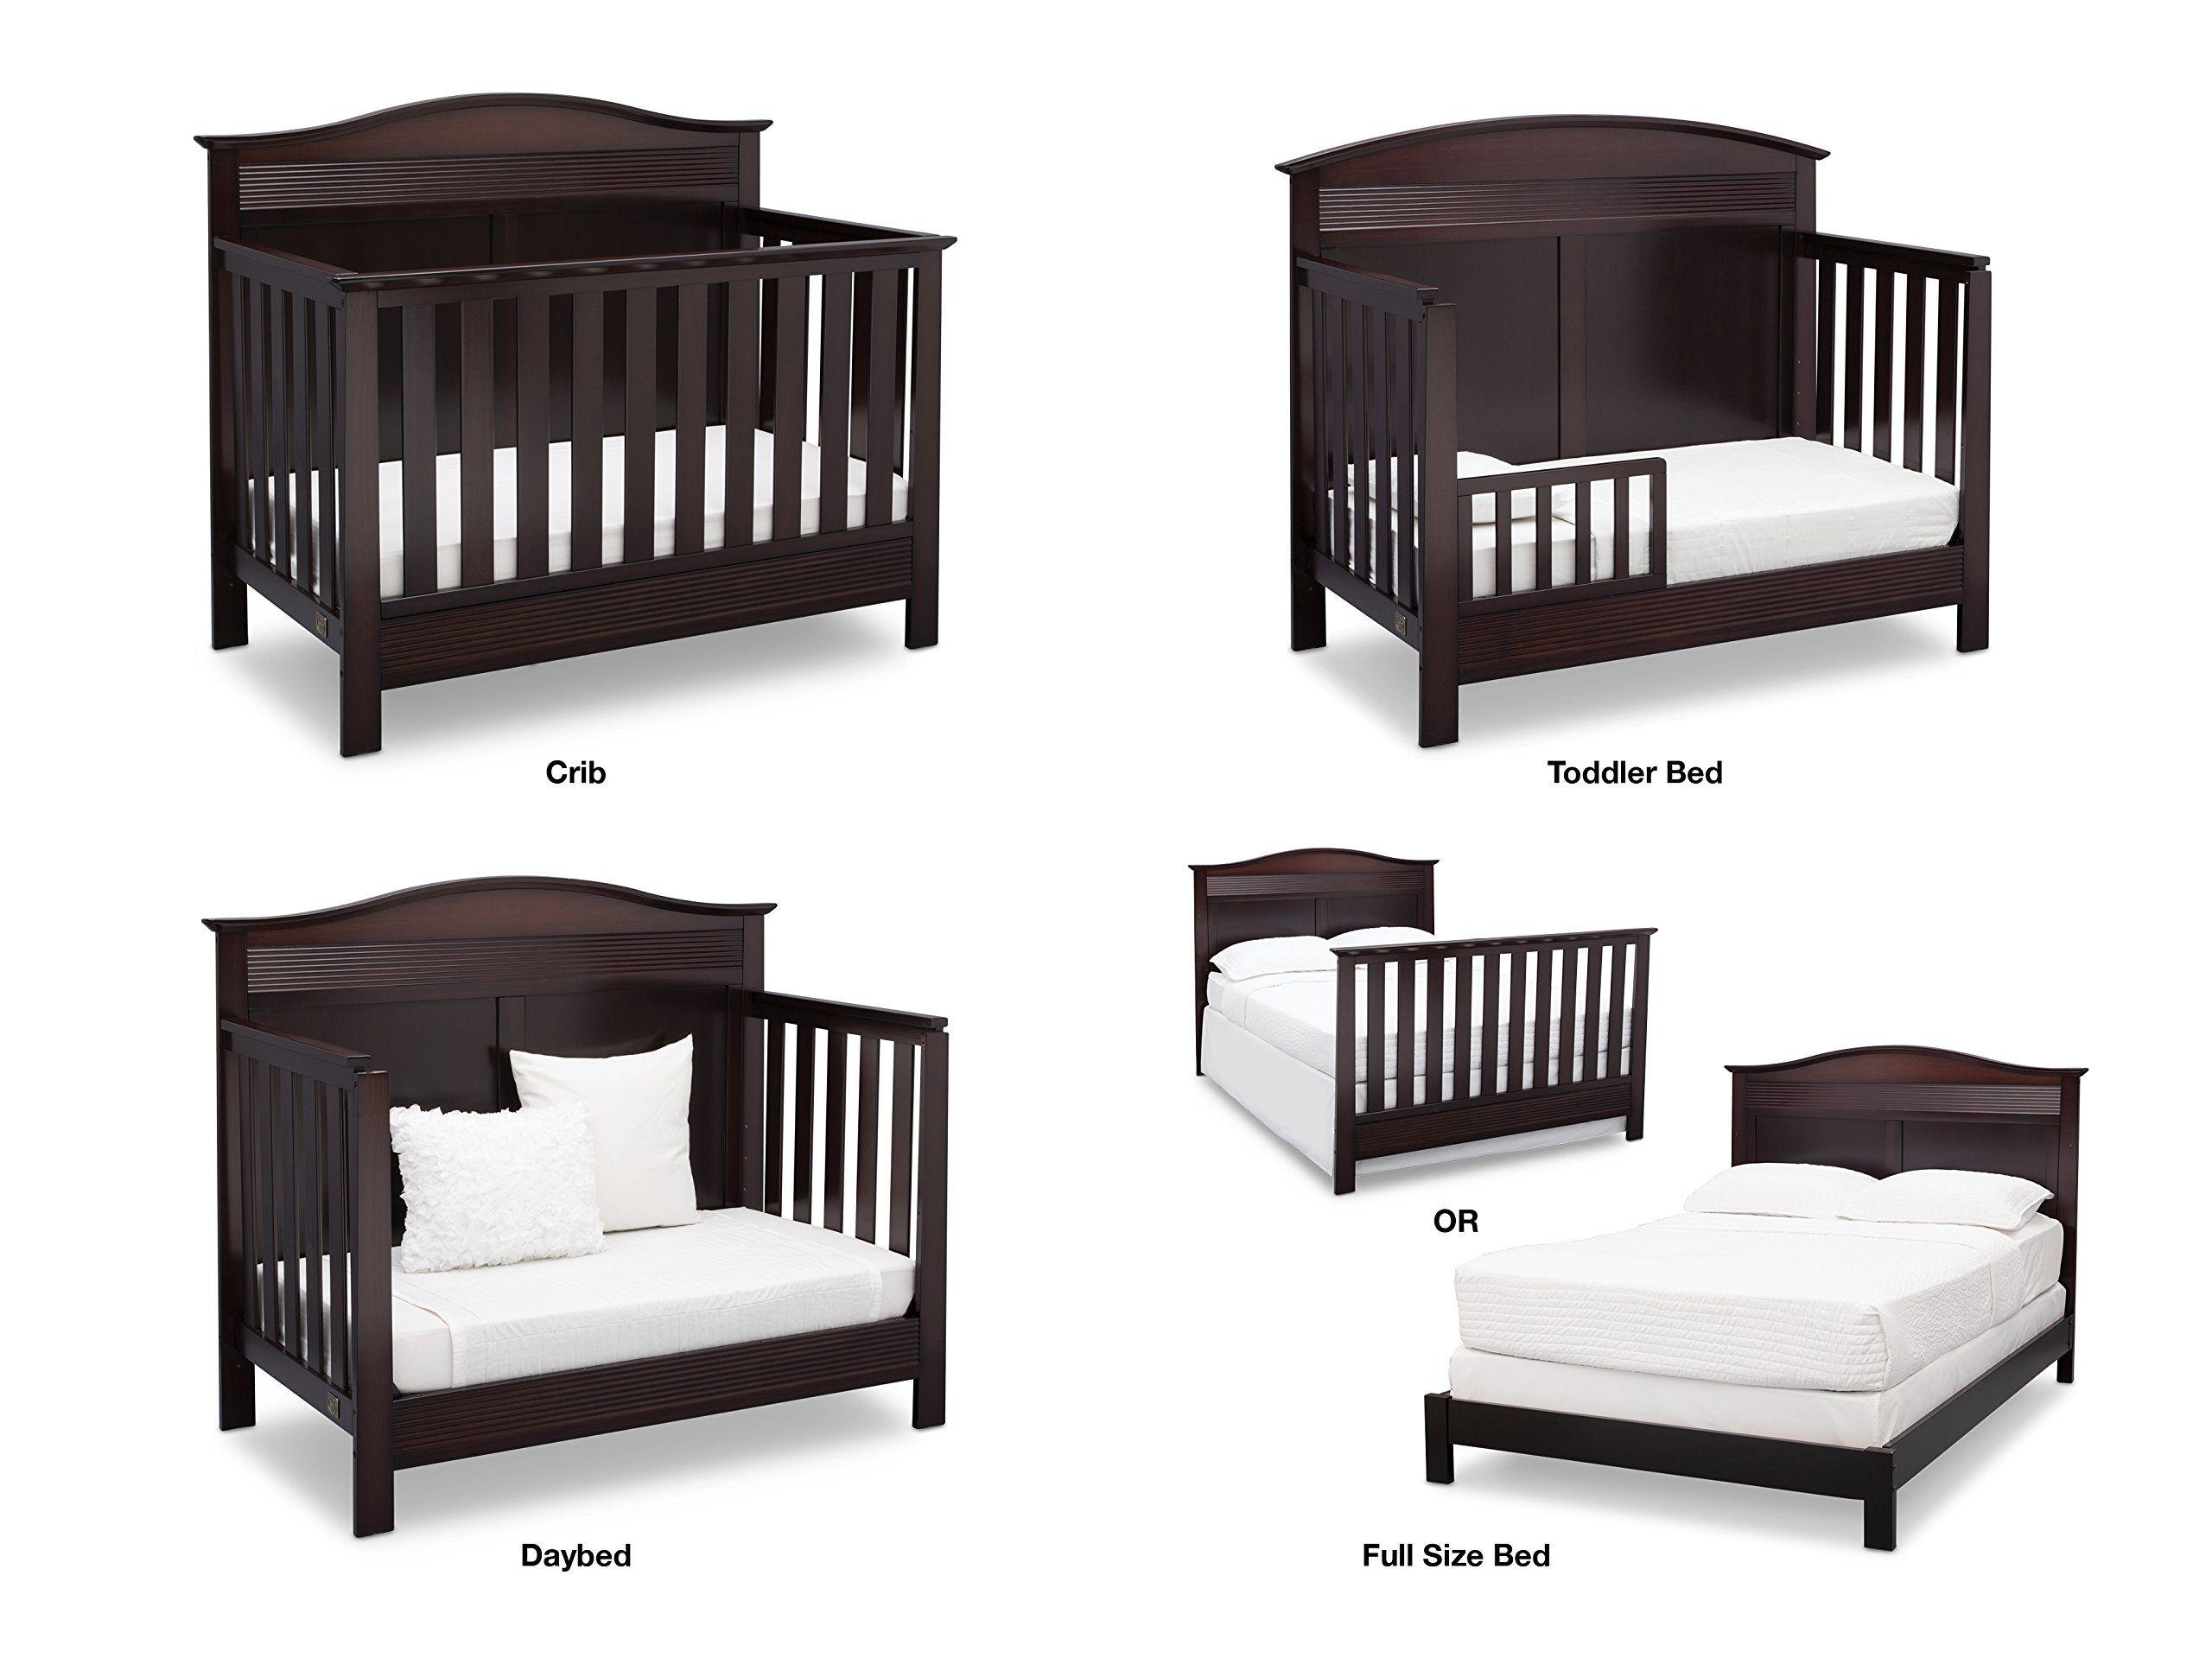 Serta Barrett 7piece Nursery Furniture Set Convertible Crib Toddler Rail Dresser Changing Top Bookcase Crib Matt Nursery Furniture Sets Cribs Convertible Crib Baby crib that converts to toddler bed